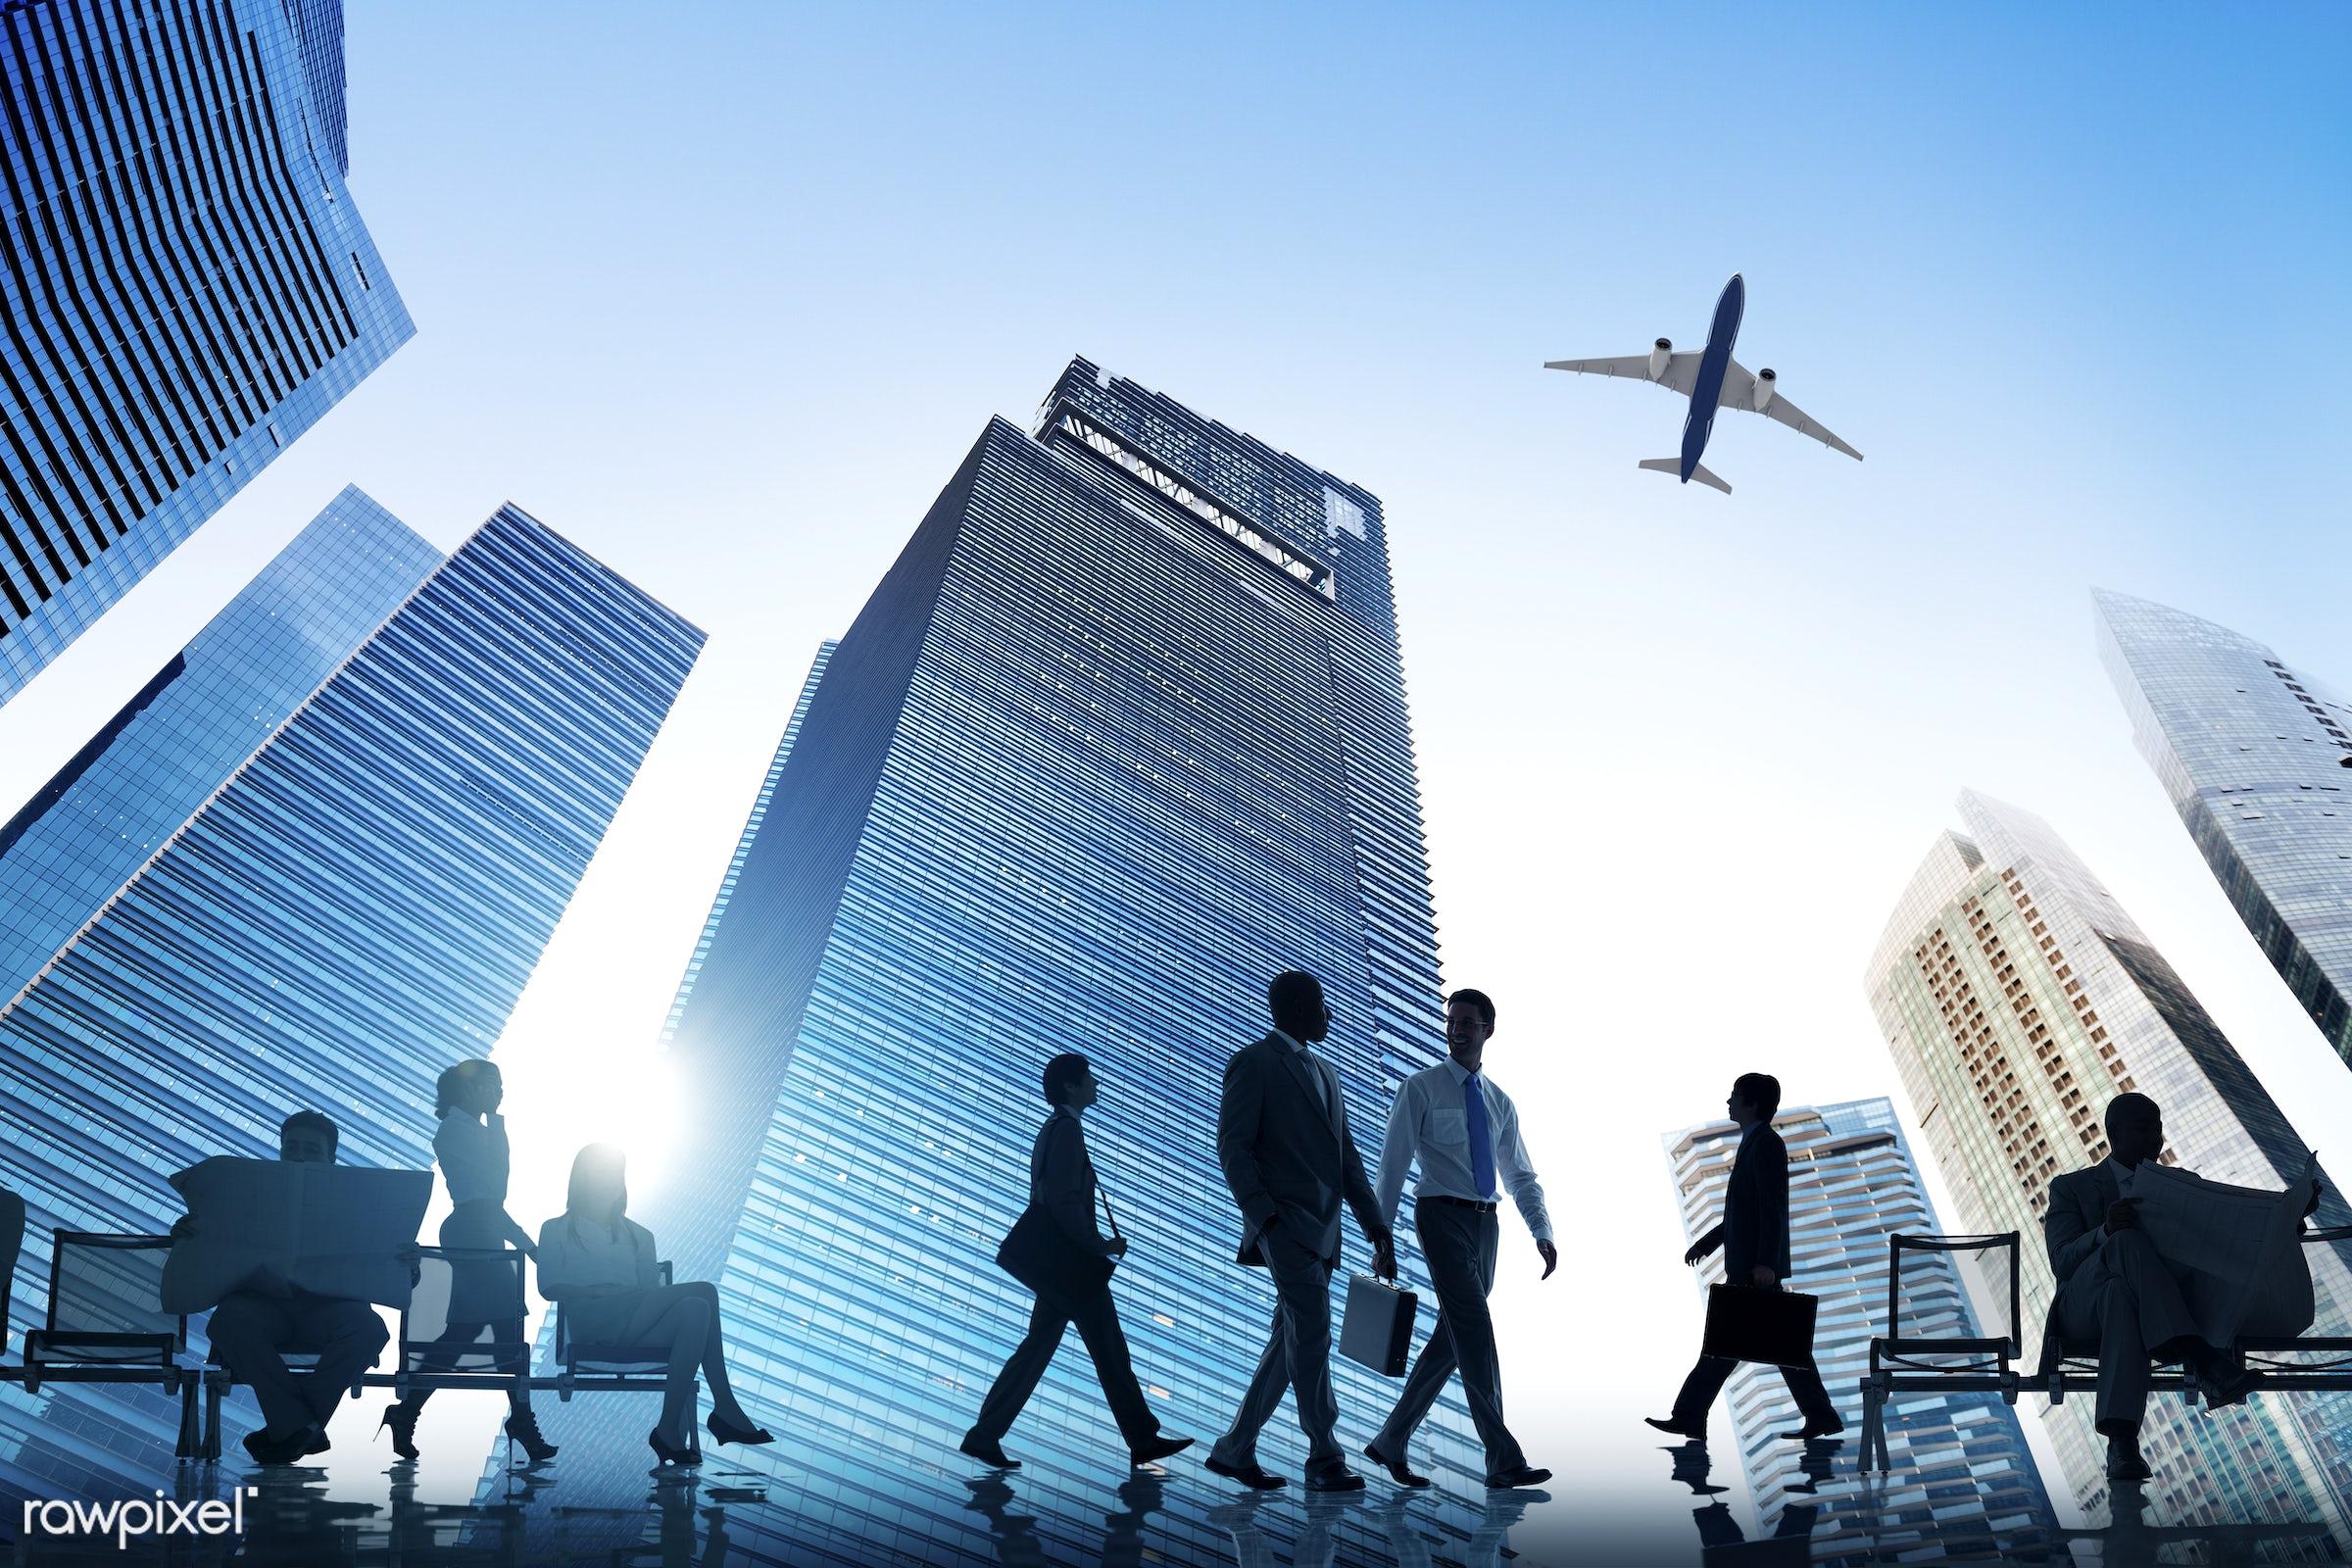 blue, brainstorming, building, business, business people, business person, businessman, businesswoman, busy, city, cityscape...